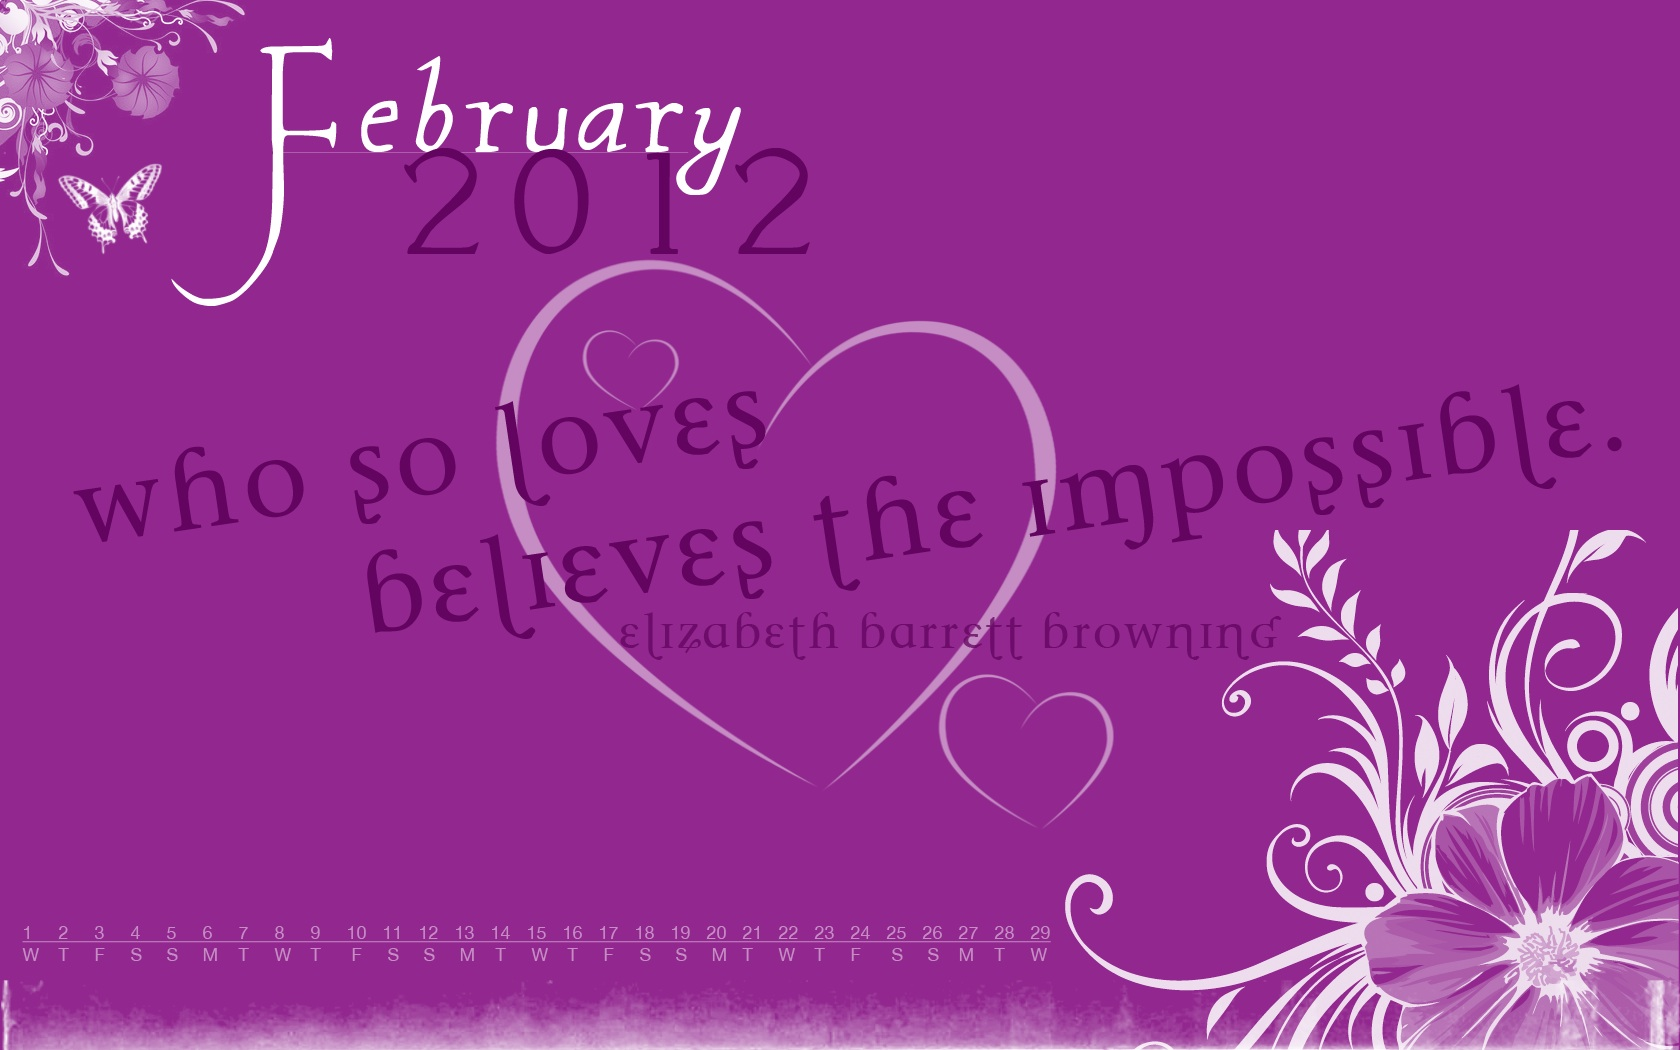 February 3rd 2012 Desktop Wallpaper Calendars February 2012 1680x1050